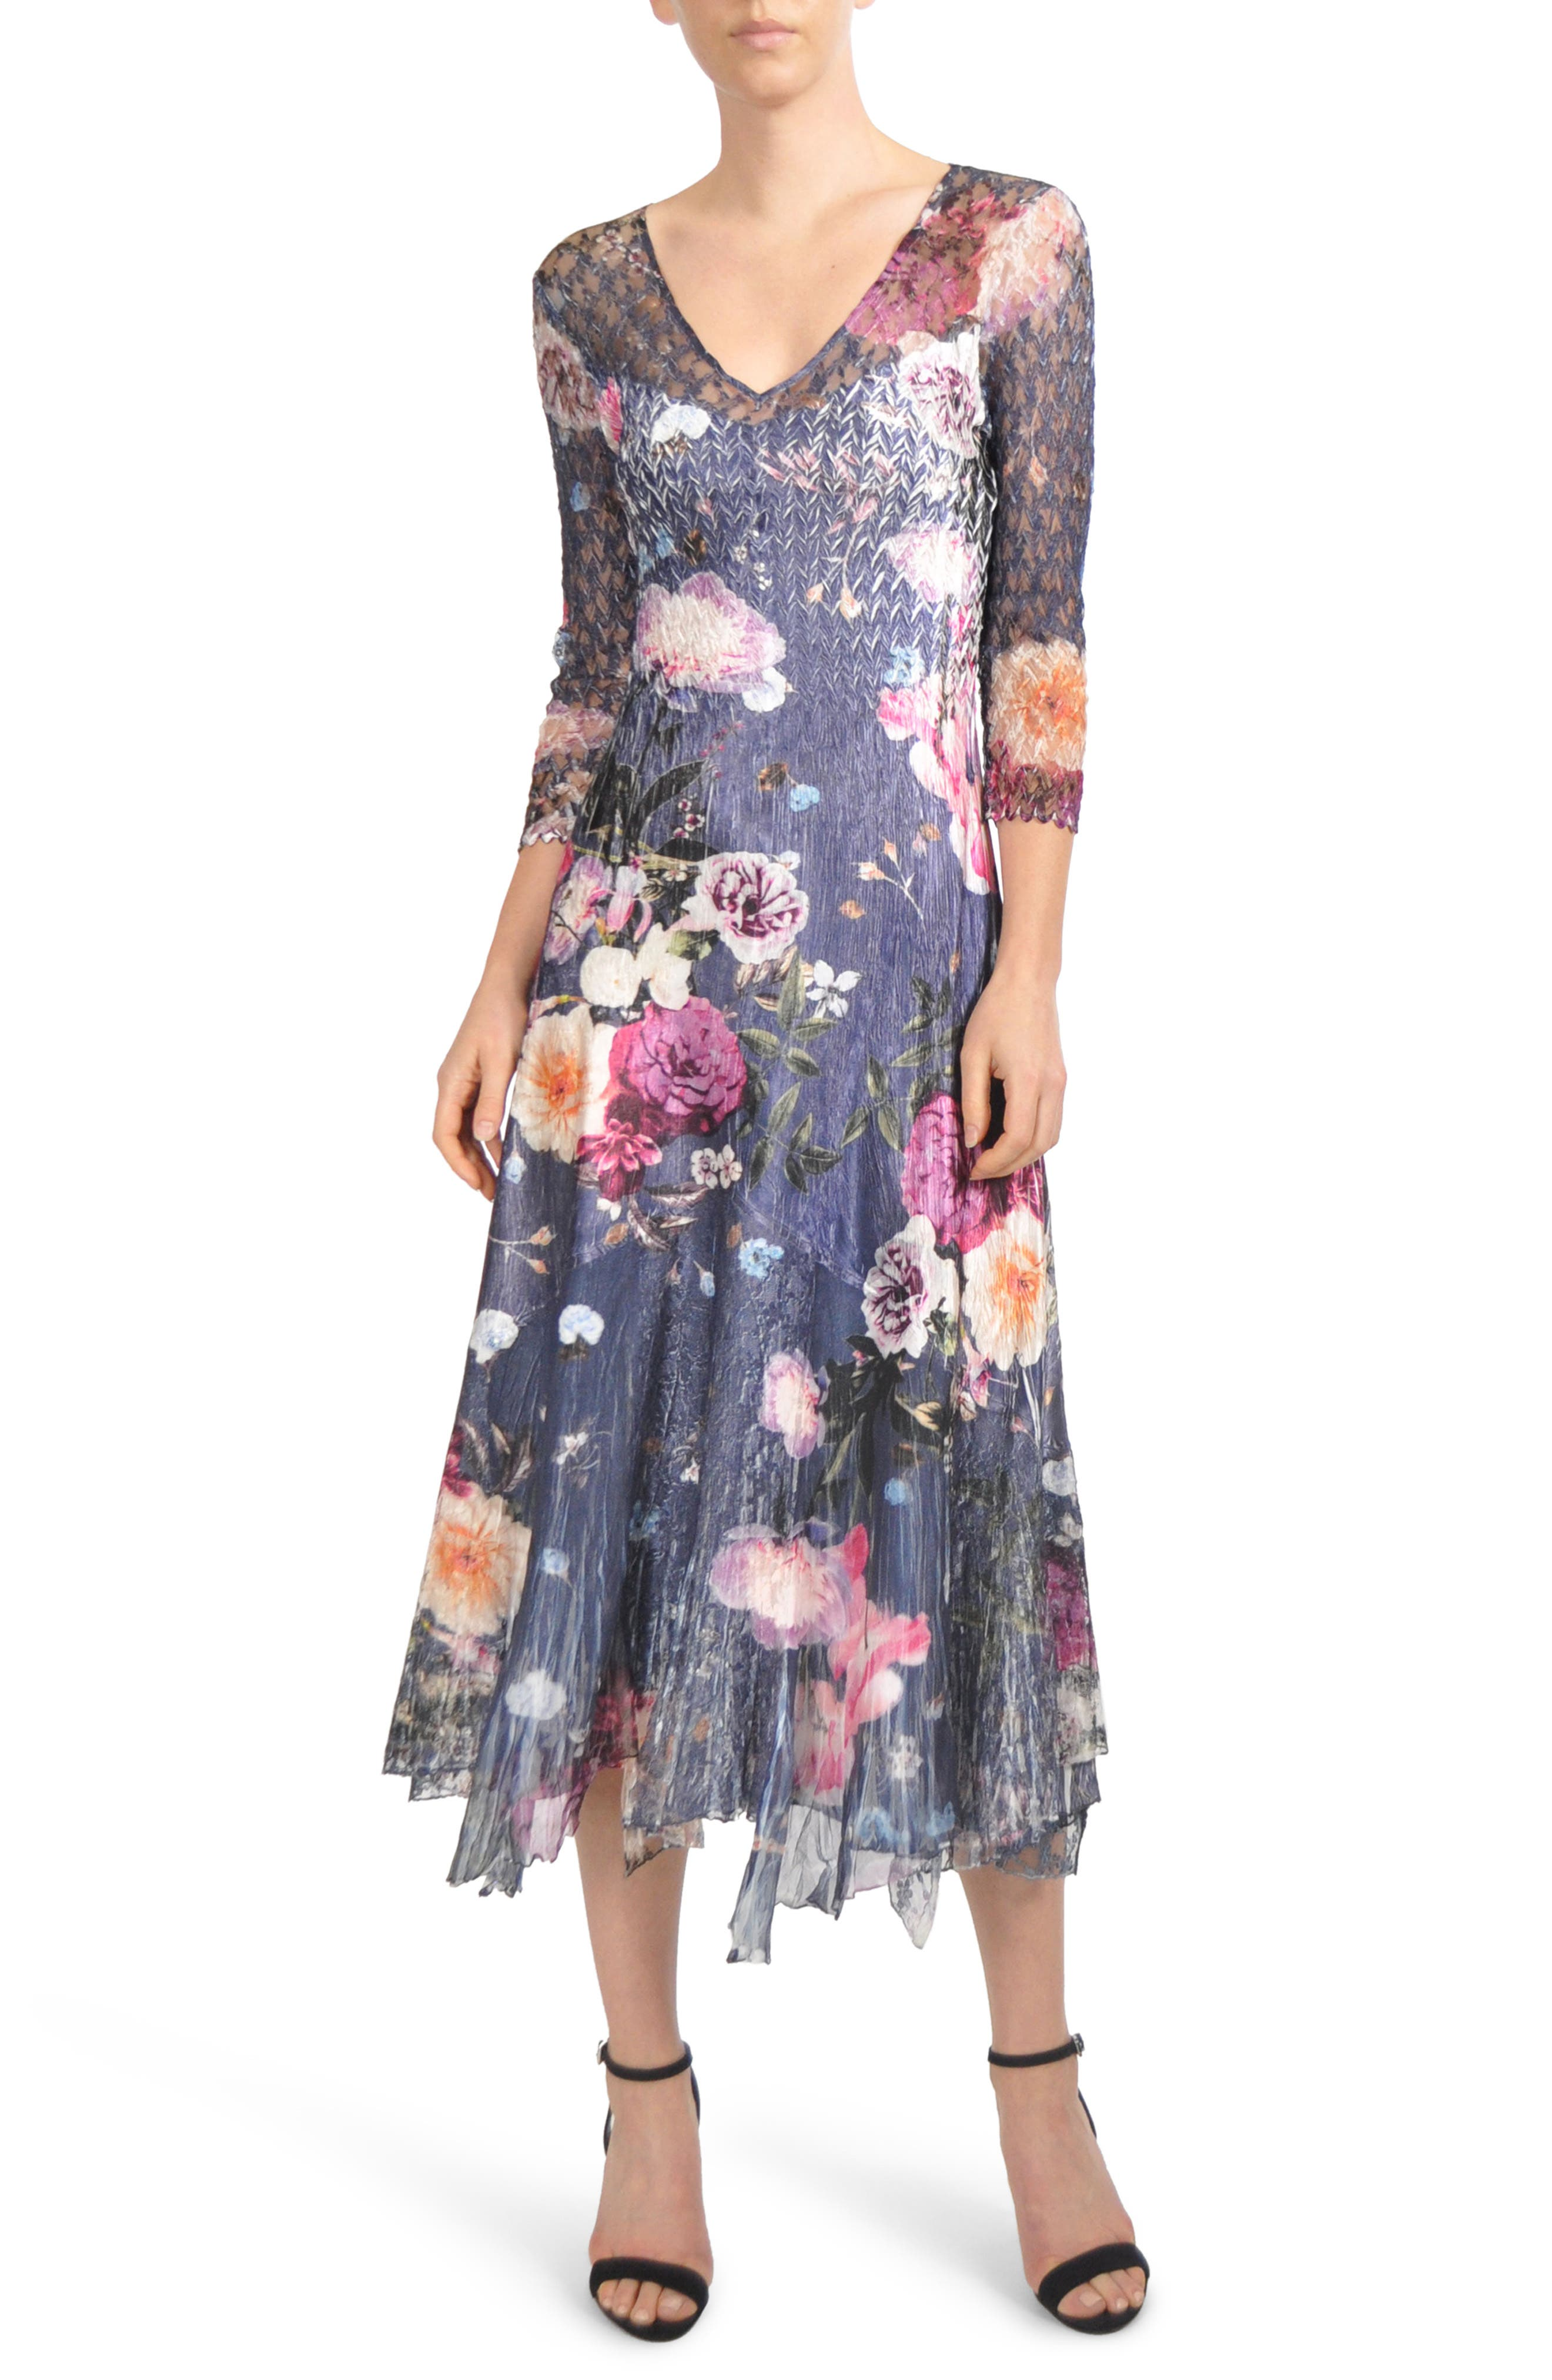 Main Image - Komarov Foral Print Lace Inset Dress (Regular & Petite)